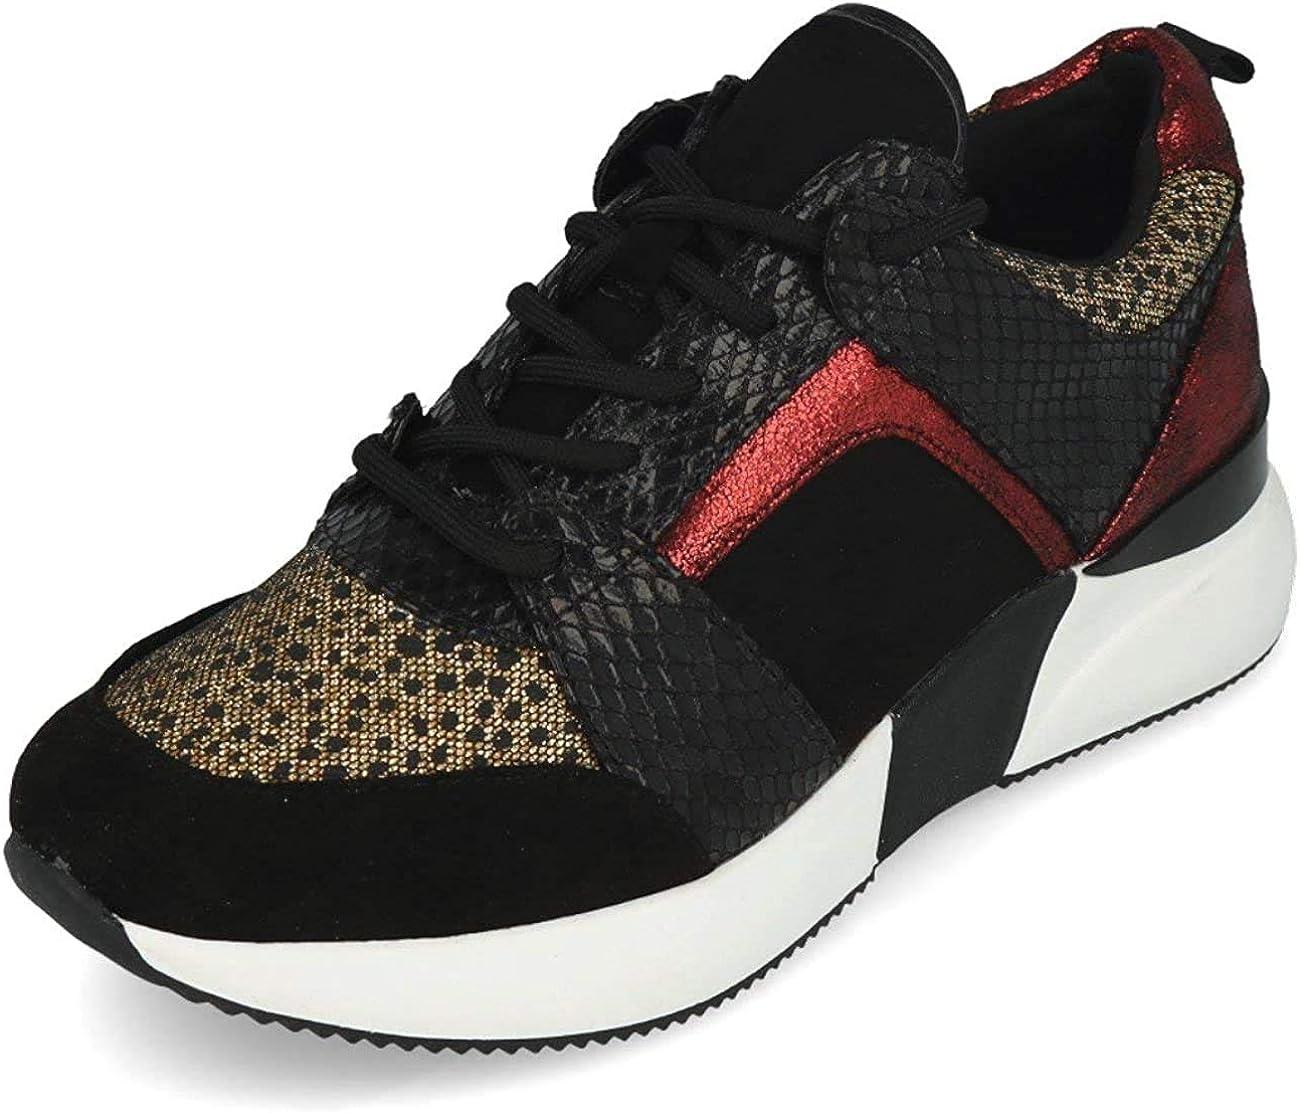 La Strada 1807433 Sneaker Cheetah Glitter Multi Noir